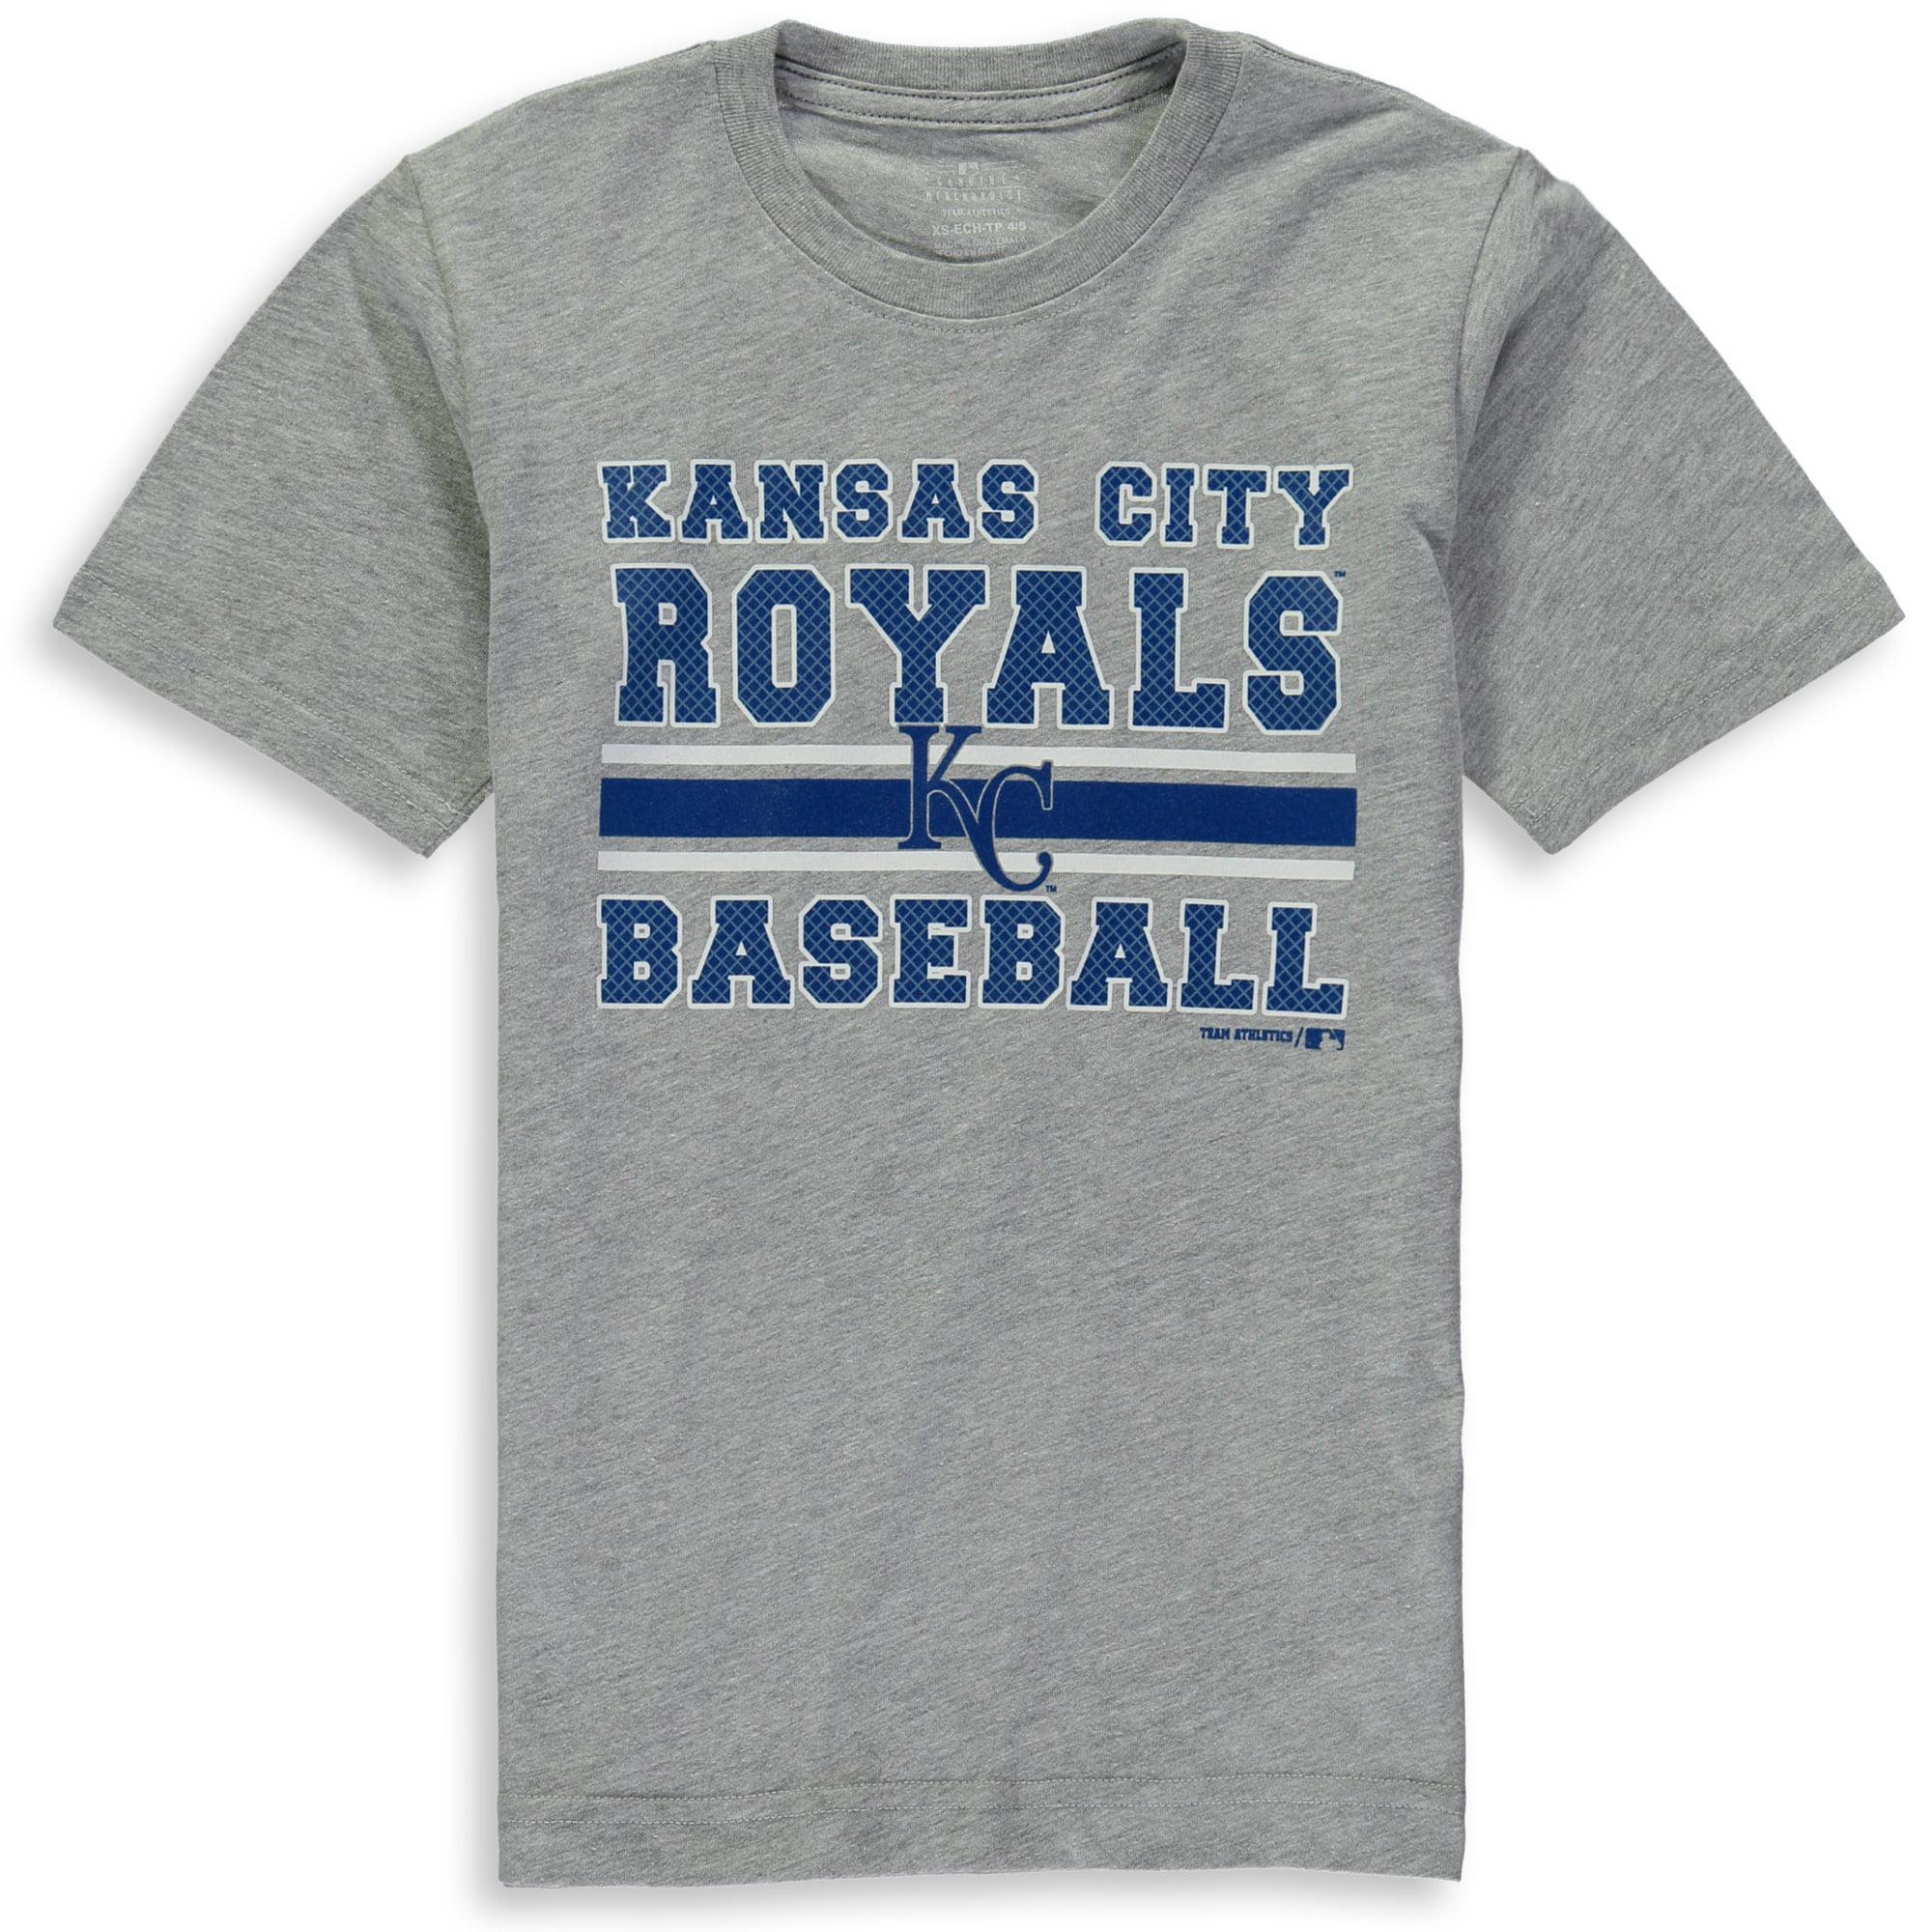 Kansas City Royals Team Shop - Walmart com